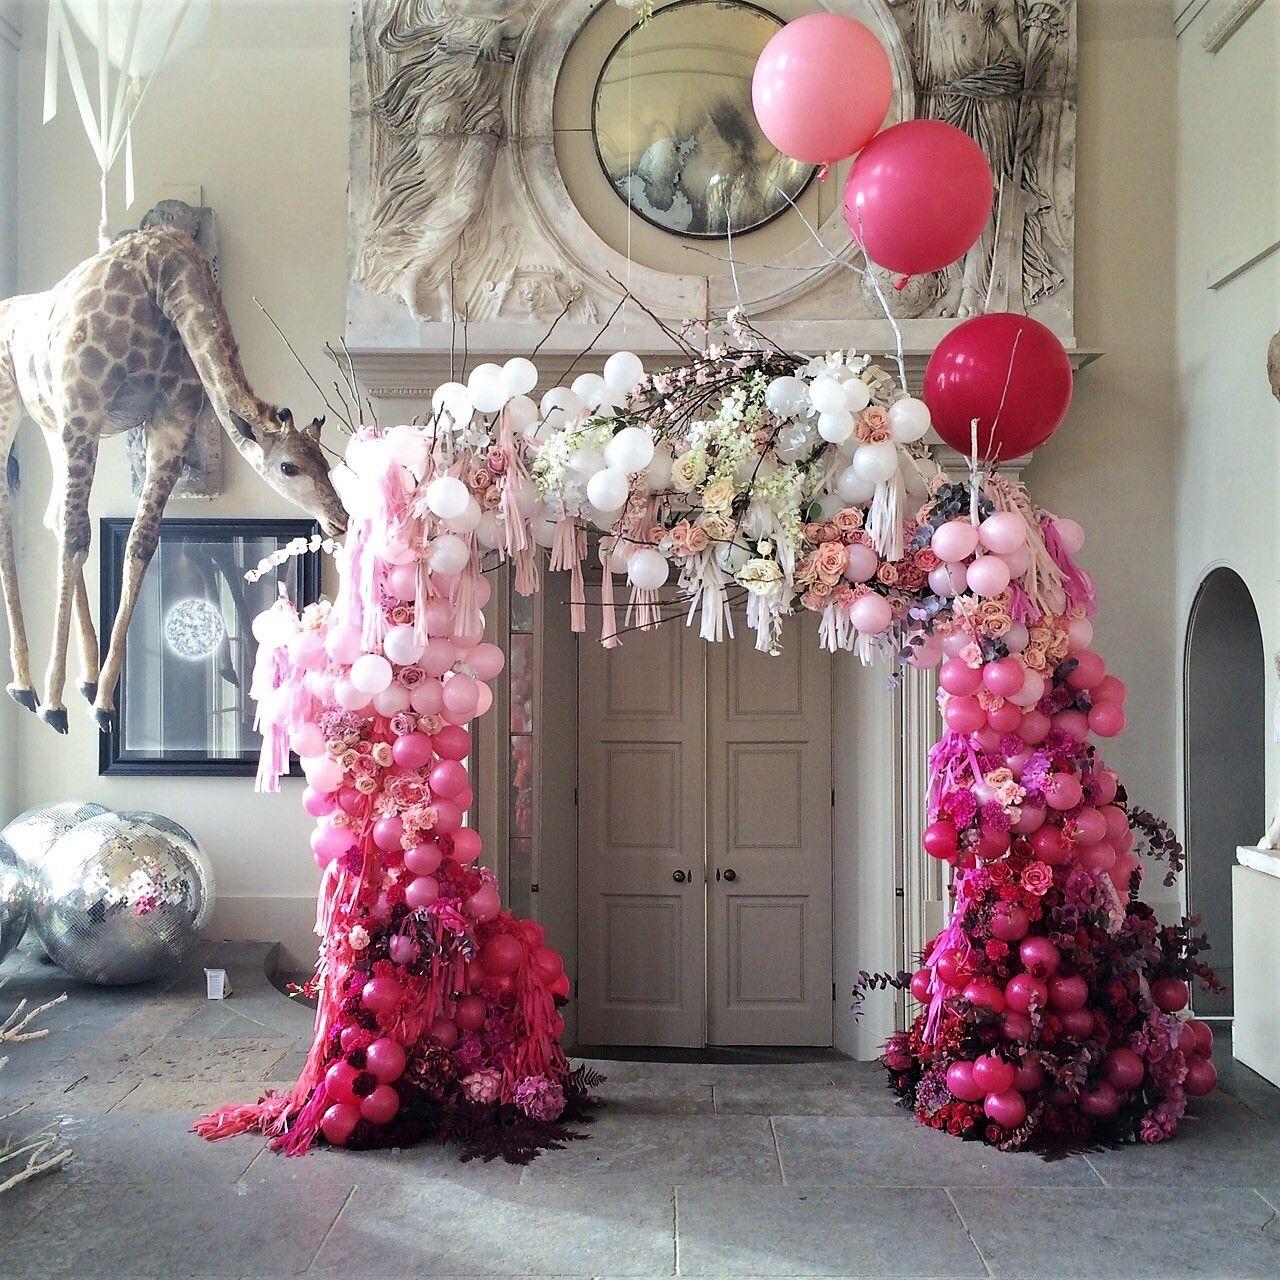 Wedding Arch Decorations Hire: Wedding Balloons, Wedding Inspiration, Wedding Decorations